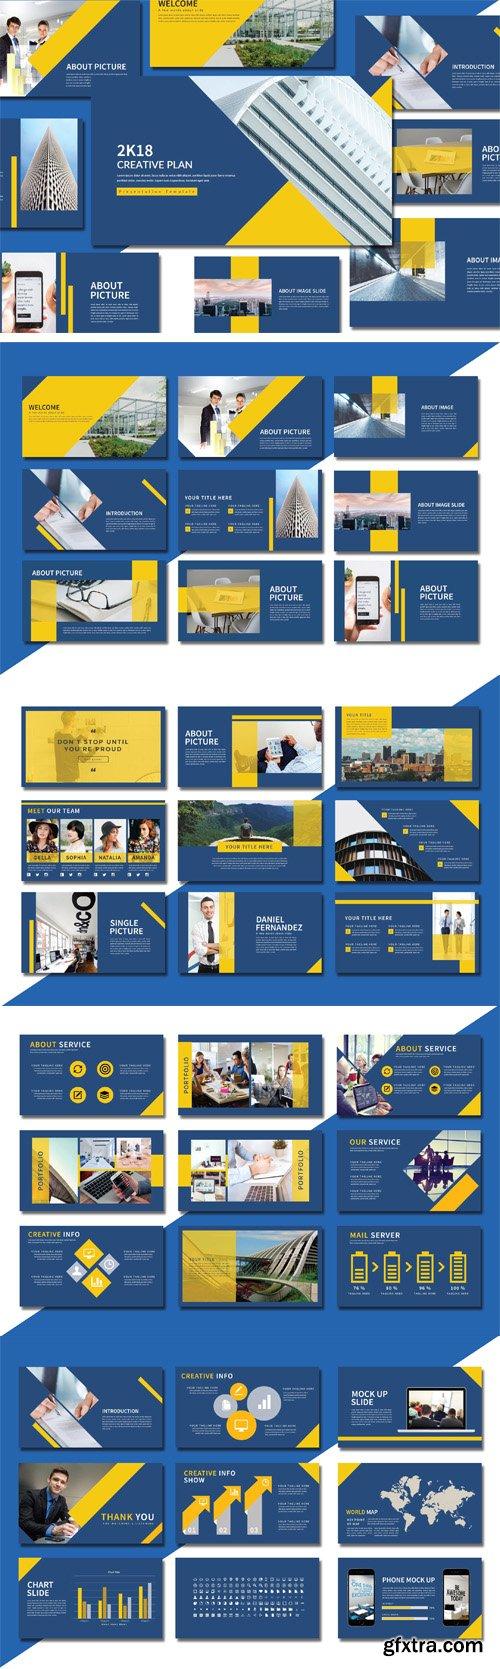 Creative Presentation Template [PPT/PPTX]